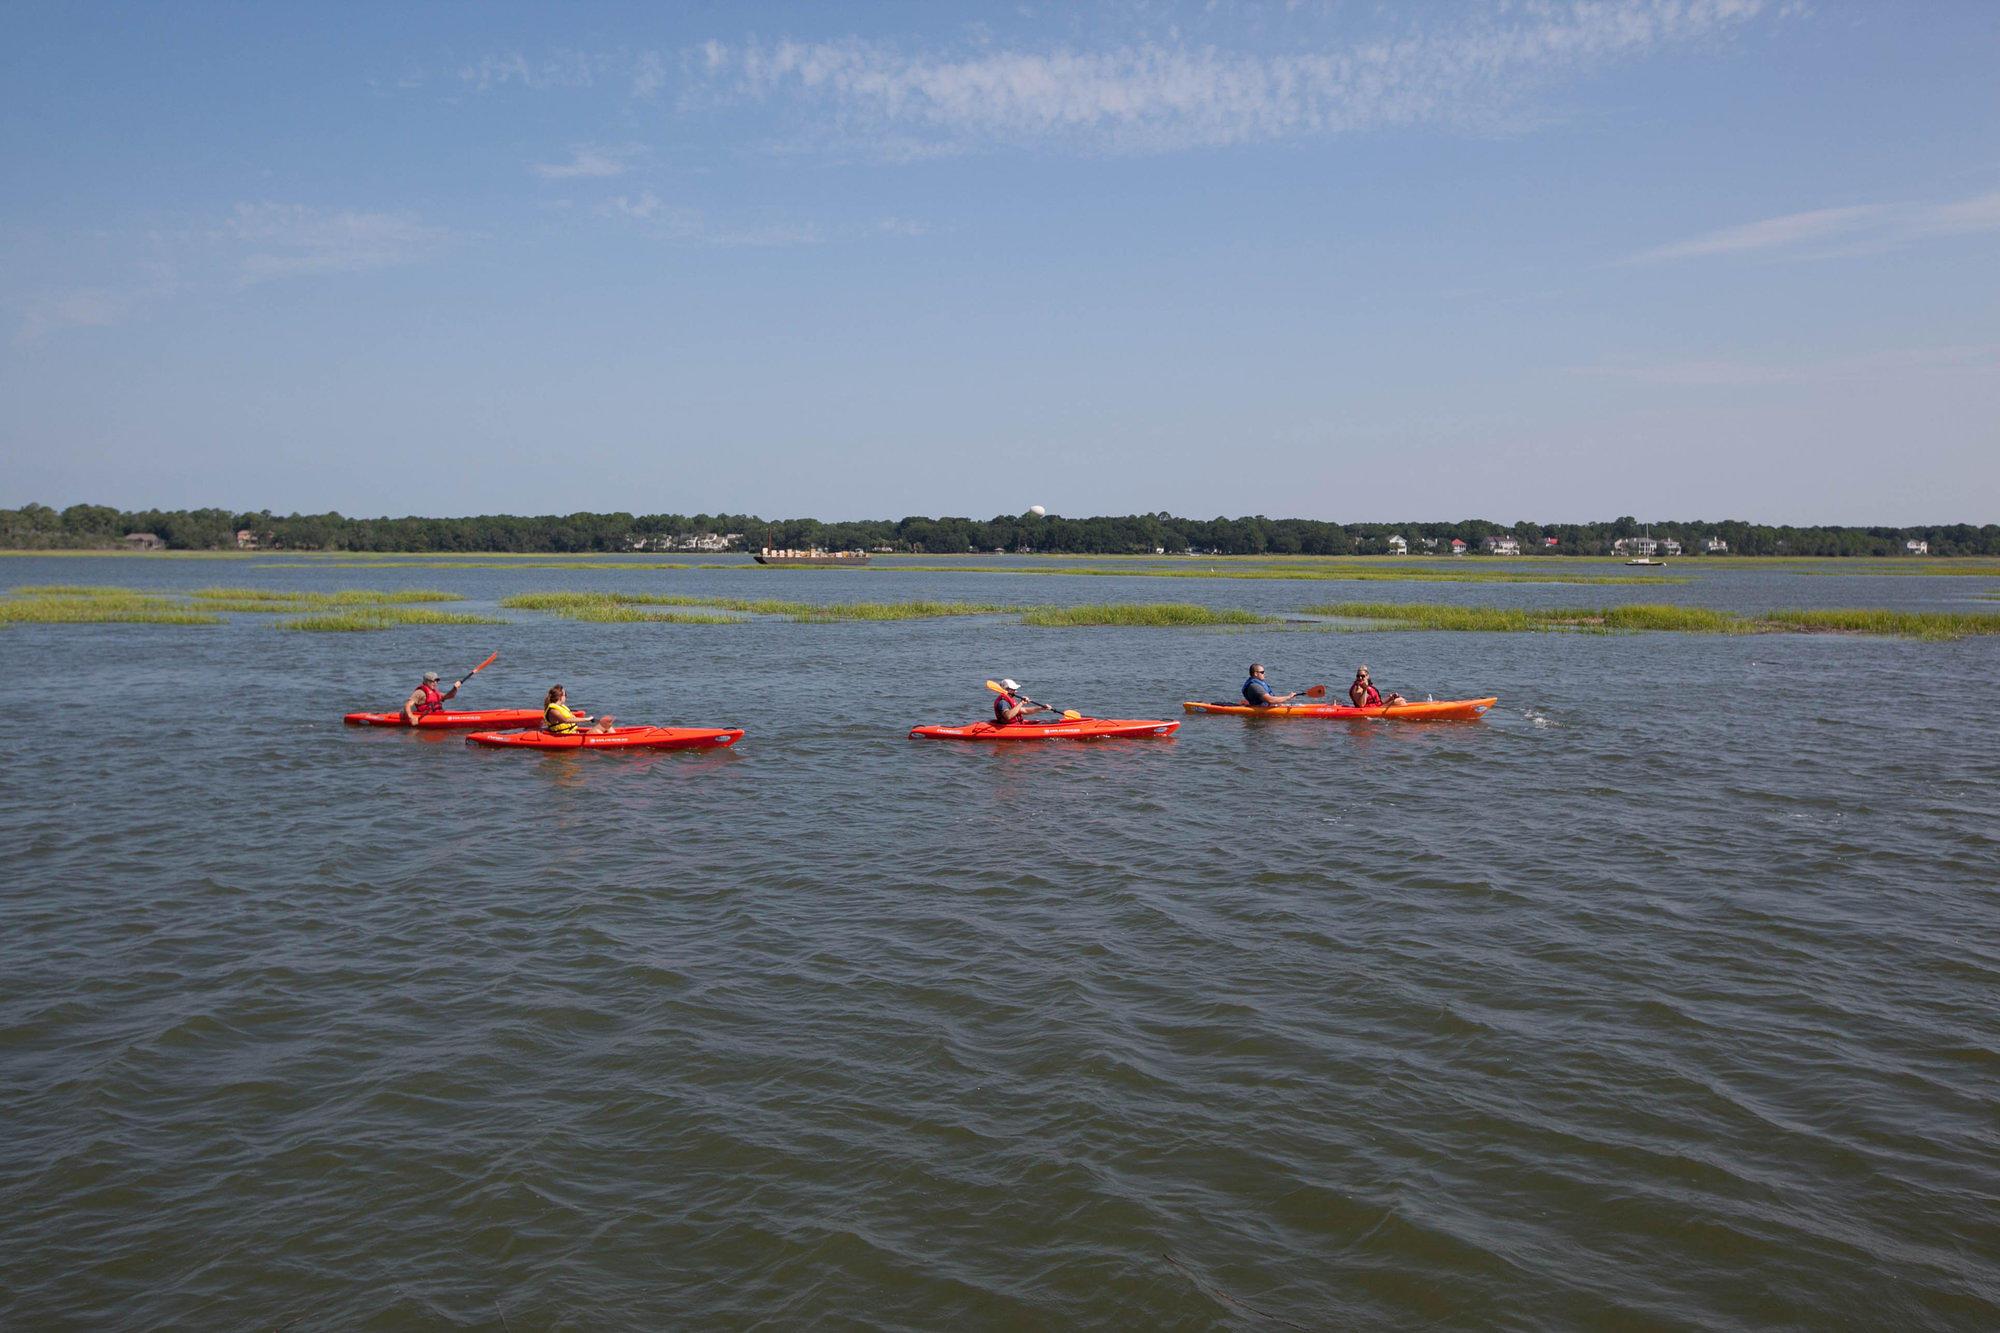 Kayaking the lagoon near Hilton Head, Georgia